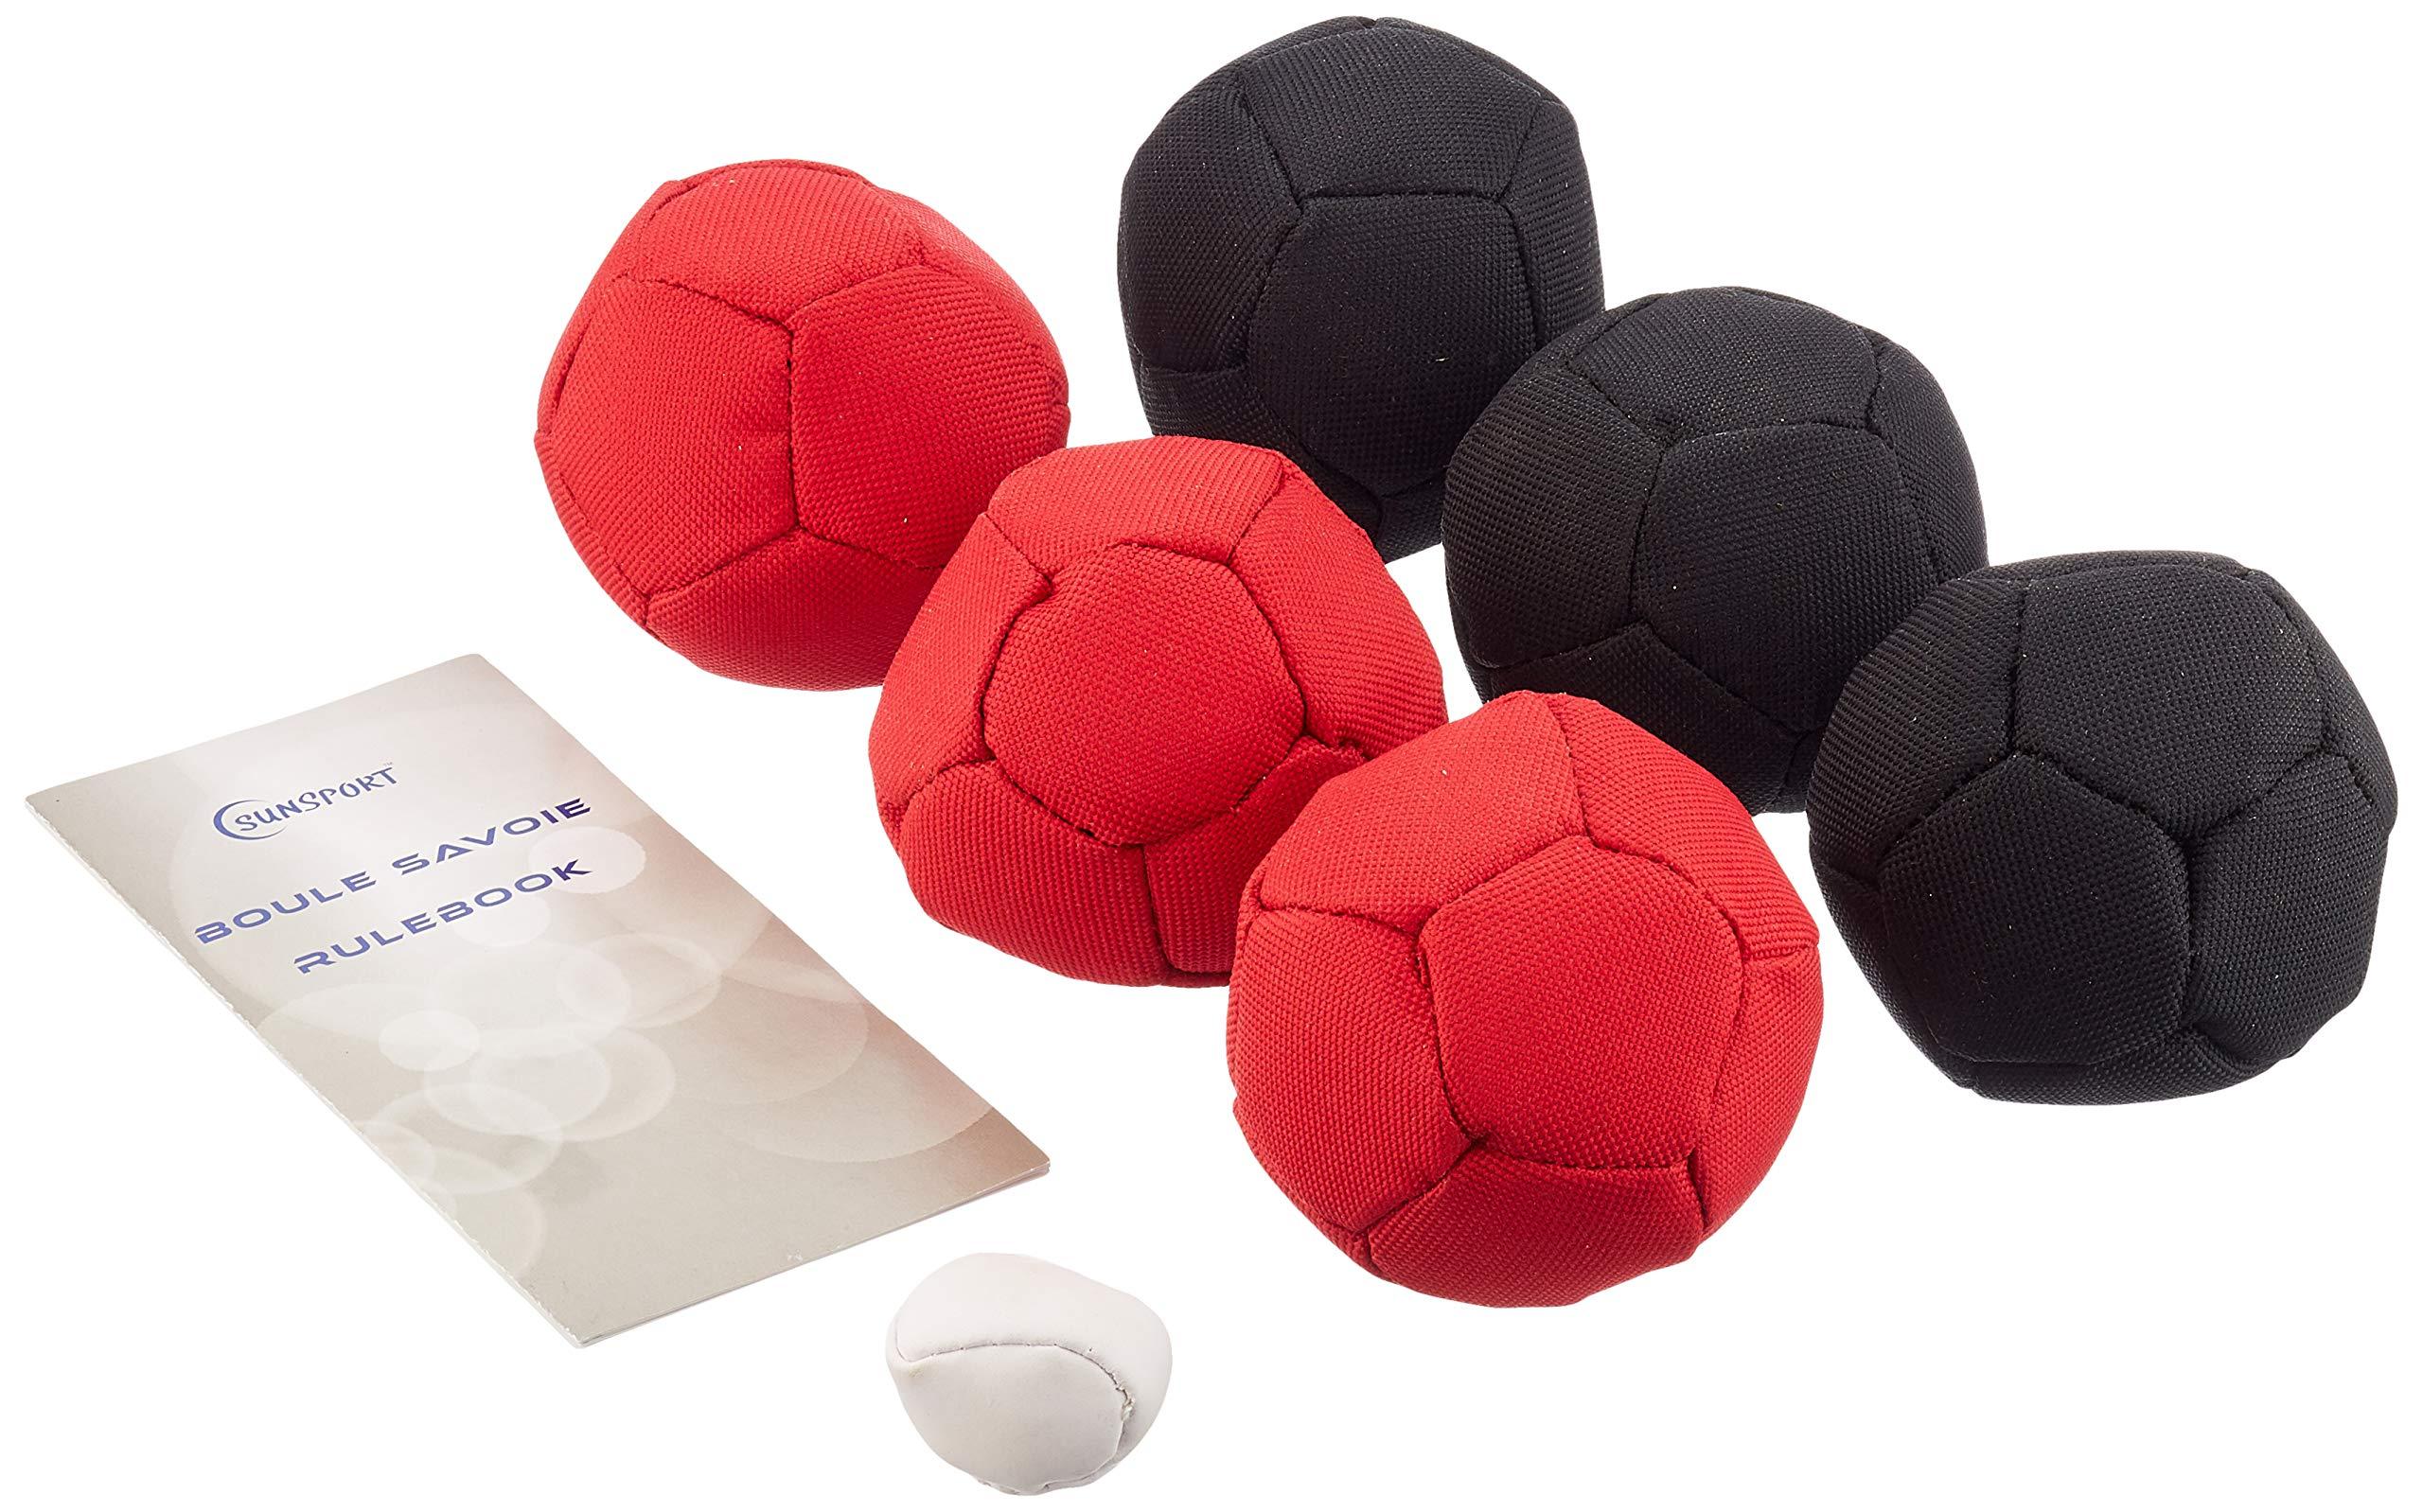 Sunsport Soft Petanque Indoor or Outdoor Game - Black/Red